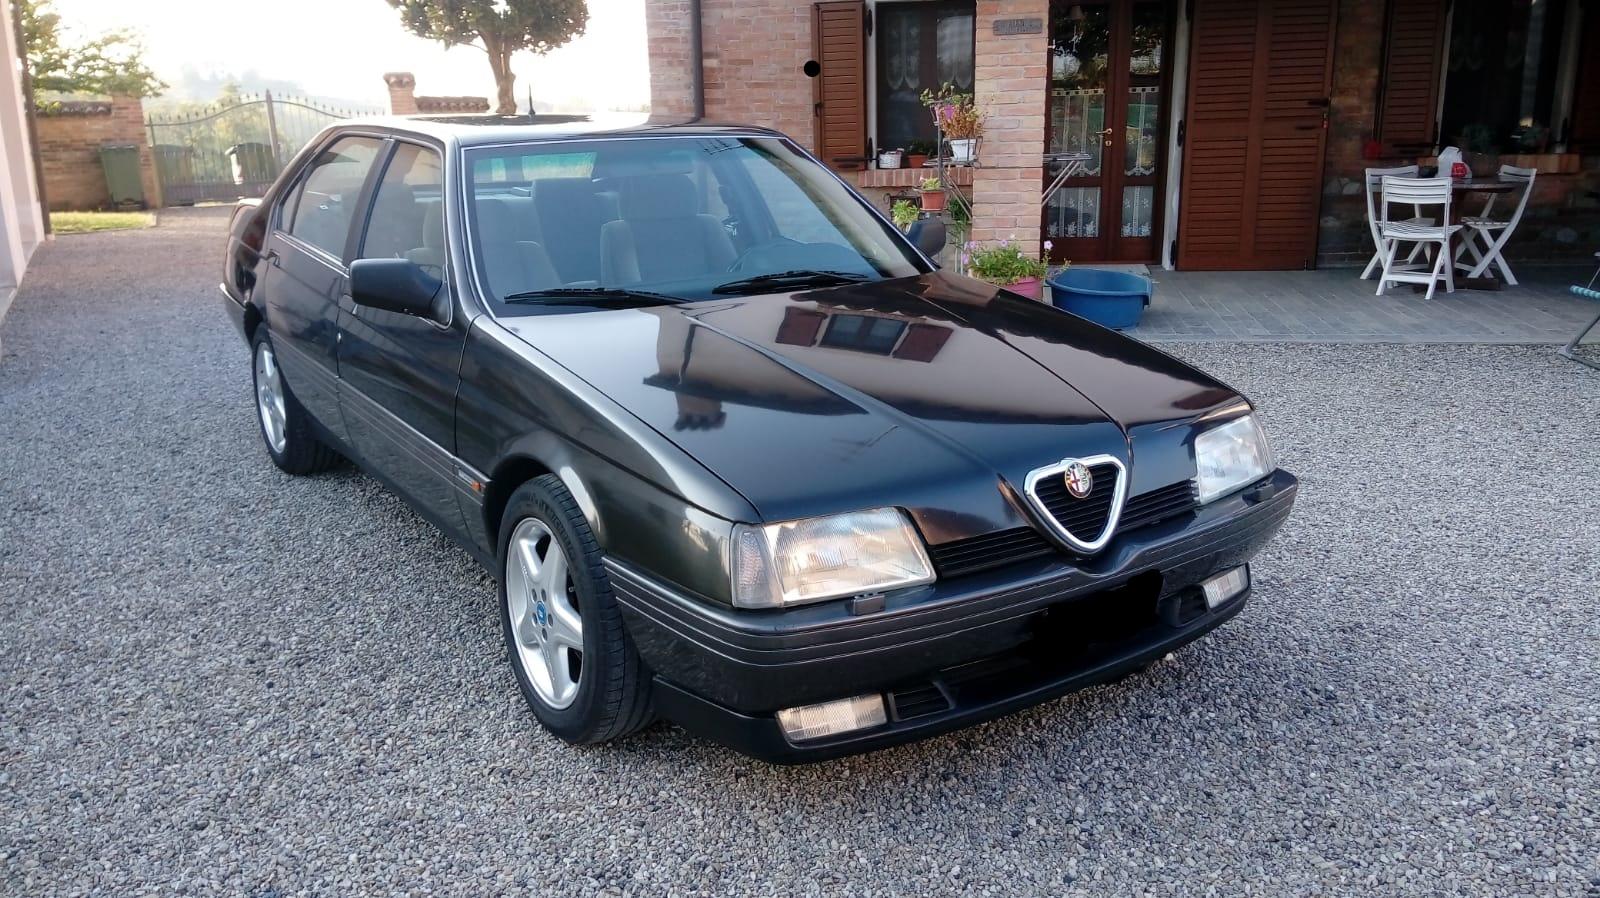 Alfa Romeo 164 >> For Sale Alfaromeo 164 2 0 I V6 Turbo